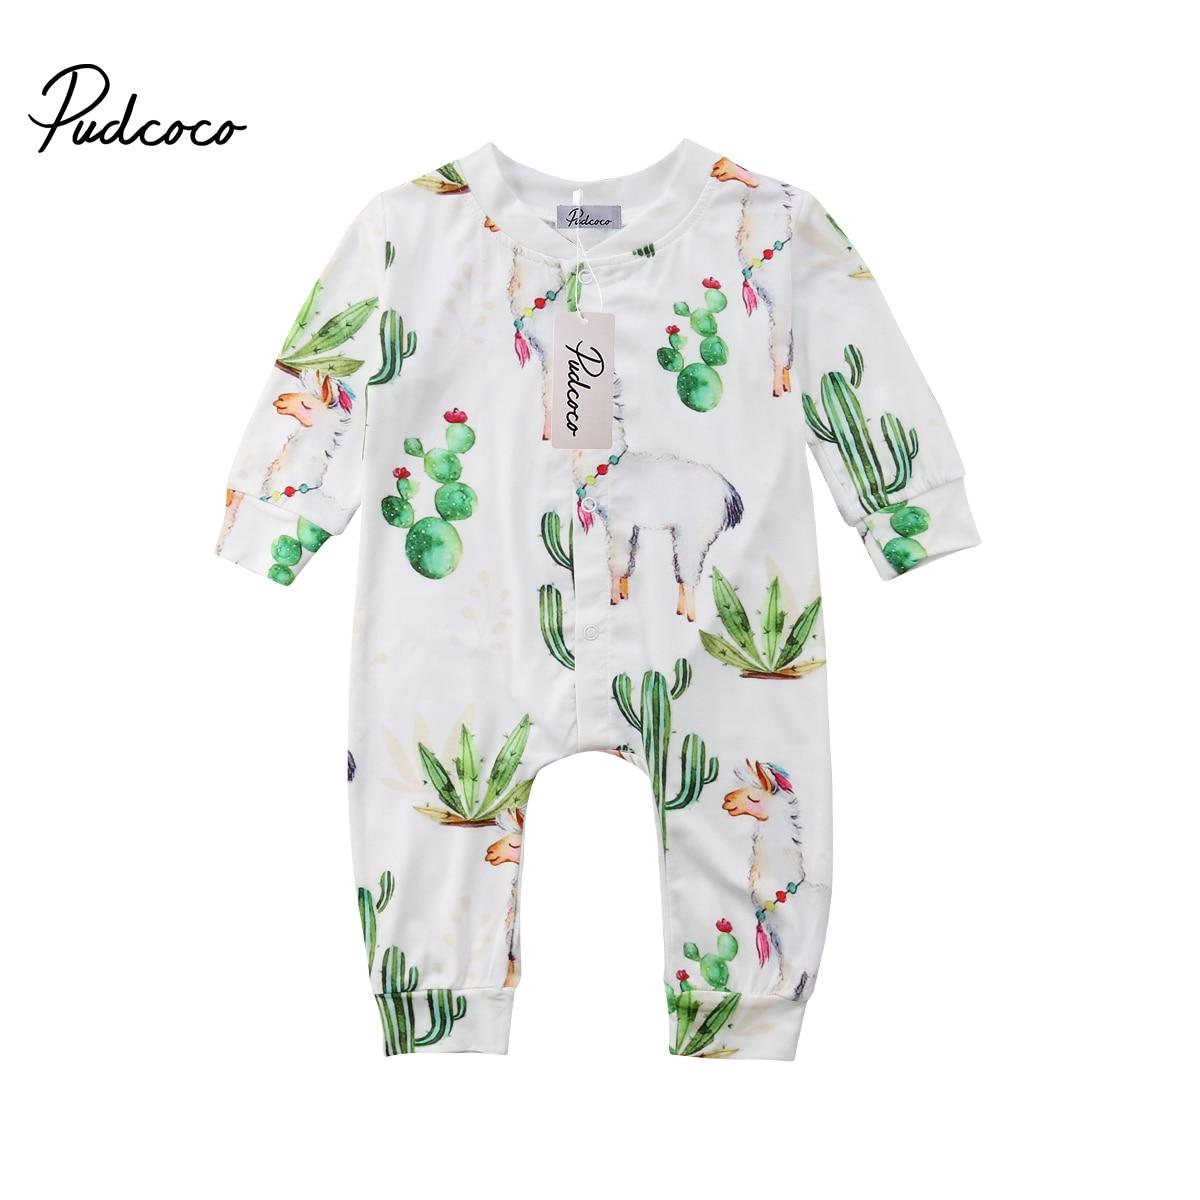 Toddler Infant Newborn Cactus Kids Baby Boy Alpaca Romper Cactus Jumpsuit Pants Long Sleeve Clothes Outfits